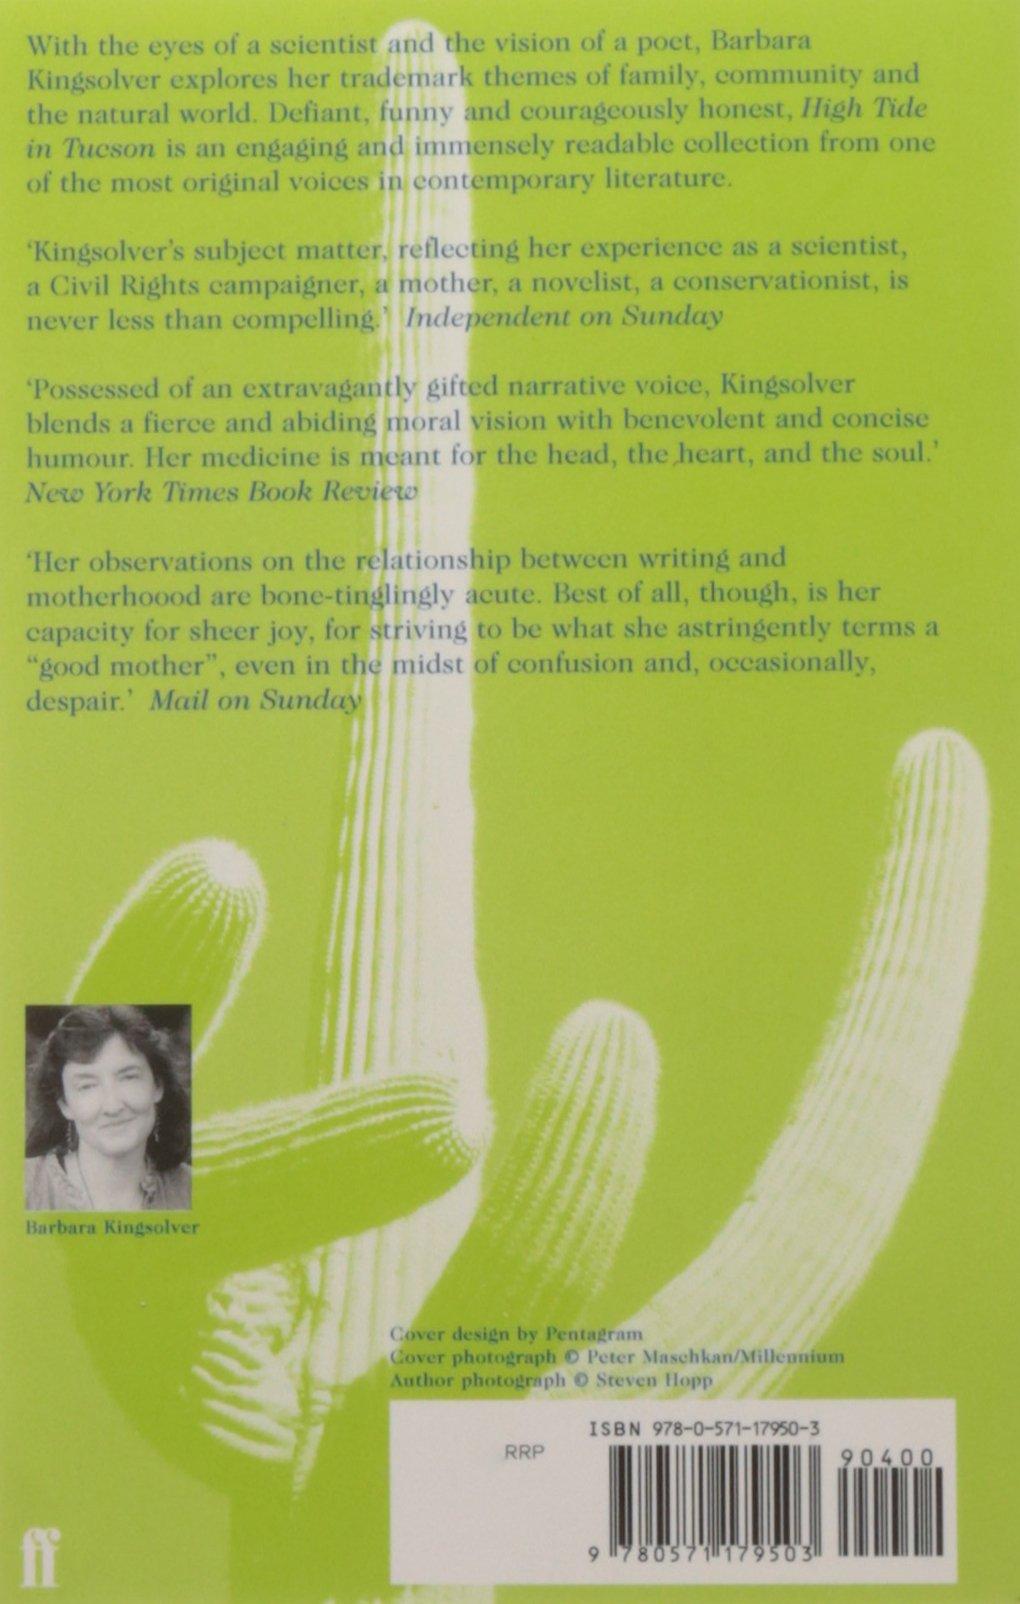 essays on animal dreams by barbara kingsolver 91 121 113 106 essays on animal dreams by barbara kingsolver